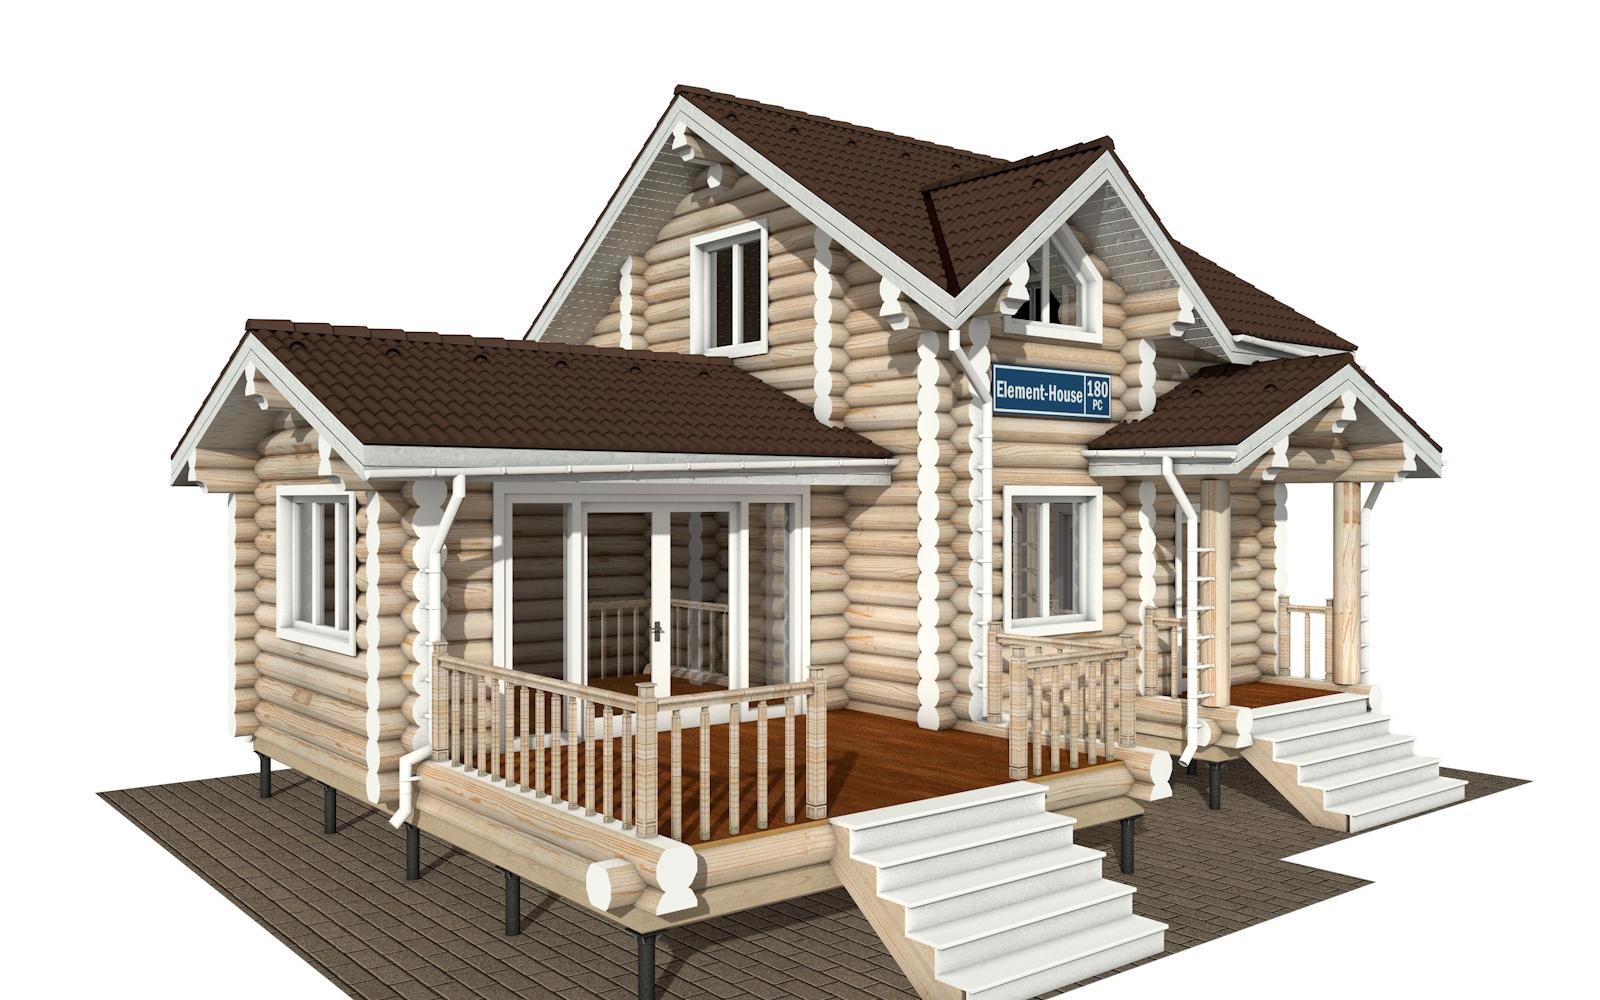 РС-180 - Проект дома из бревна с мансардой